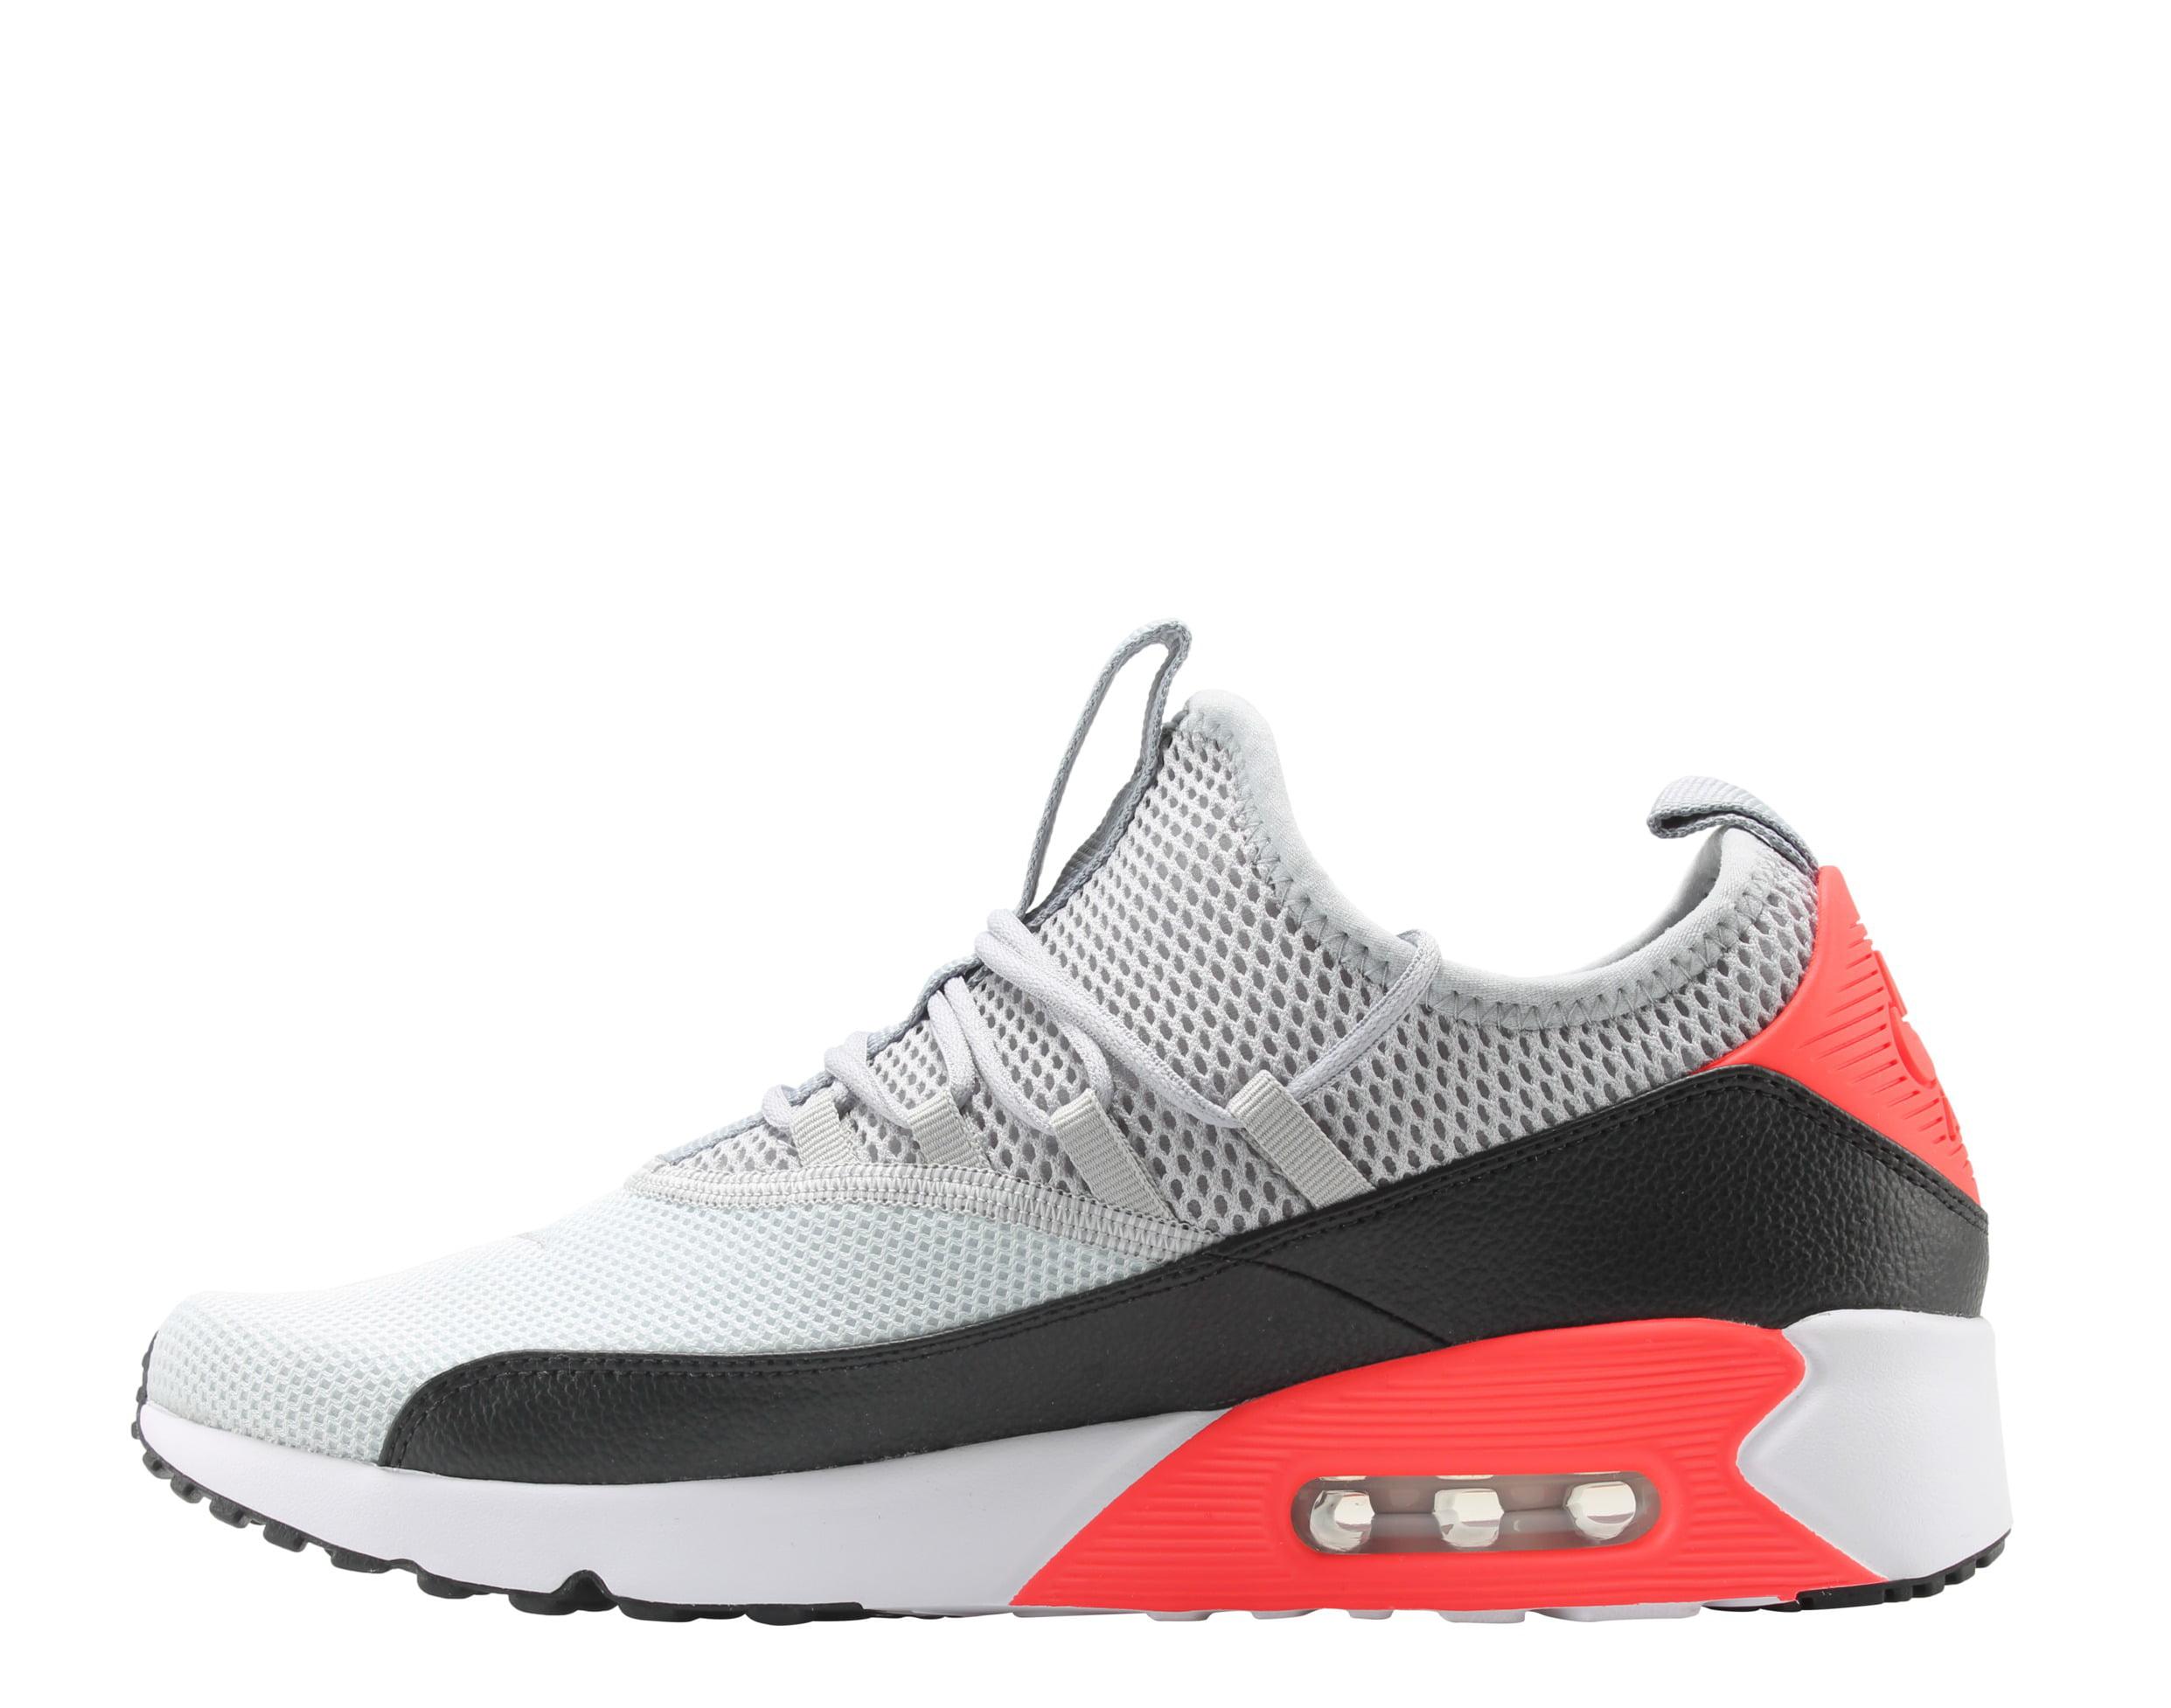 Sporting Goods Nike Air Max 90 EZ Grey Black Infrared Red